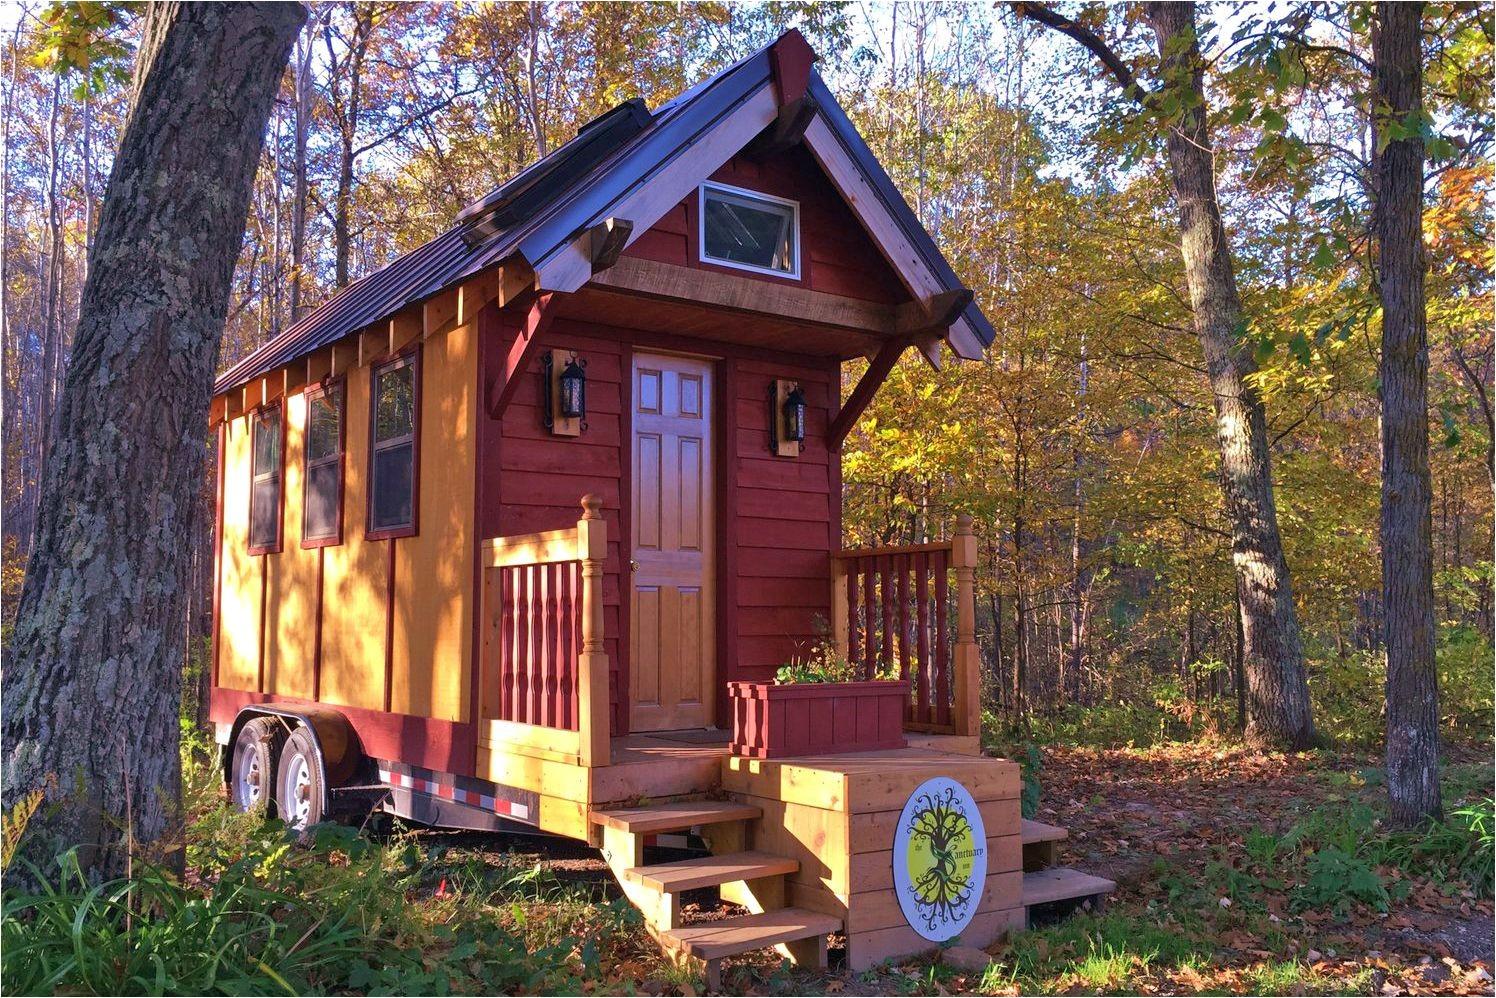 sanctuary minnesota village tiny house com 590375273df78c5456272fca jpg